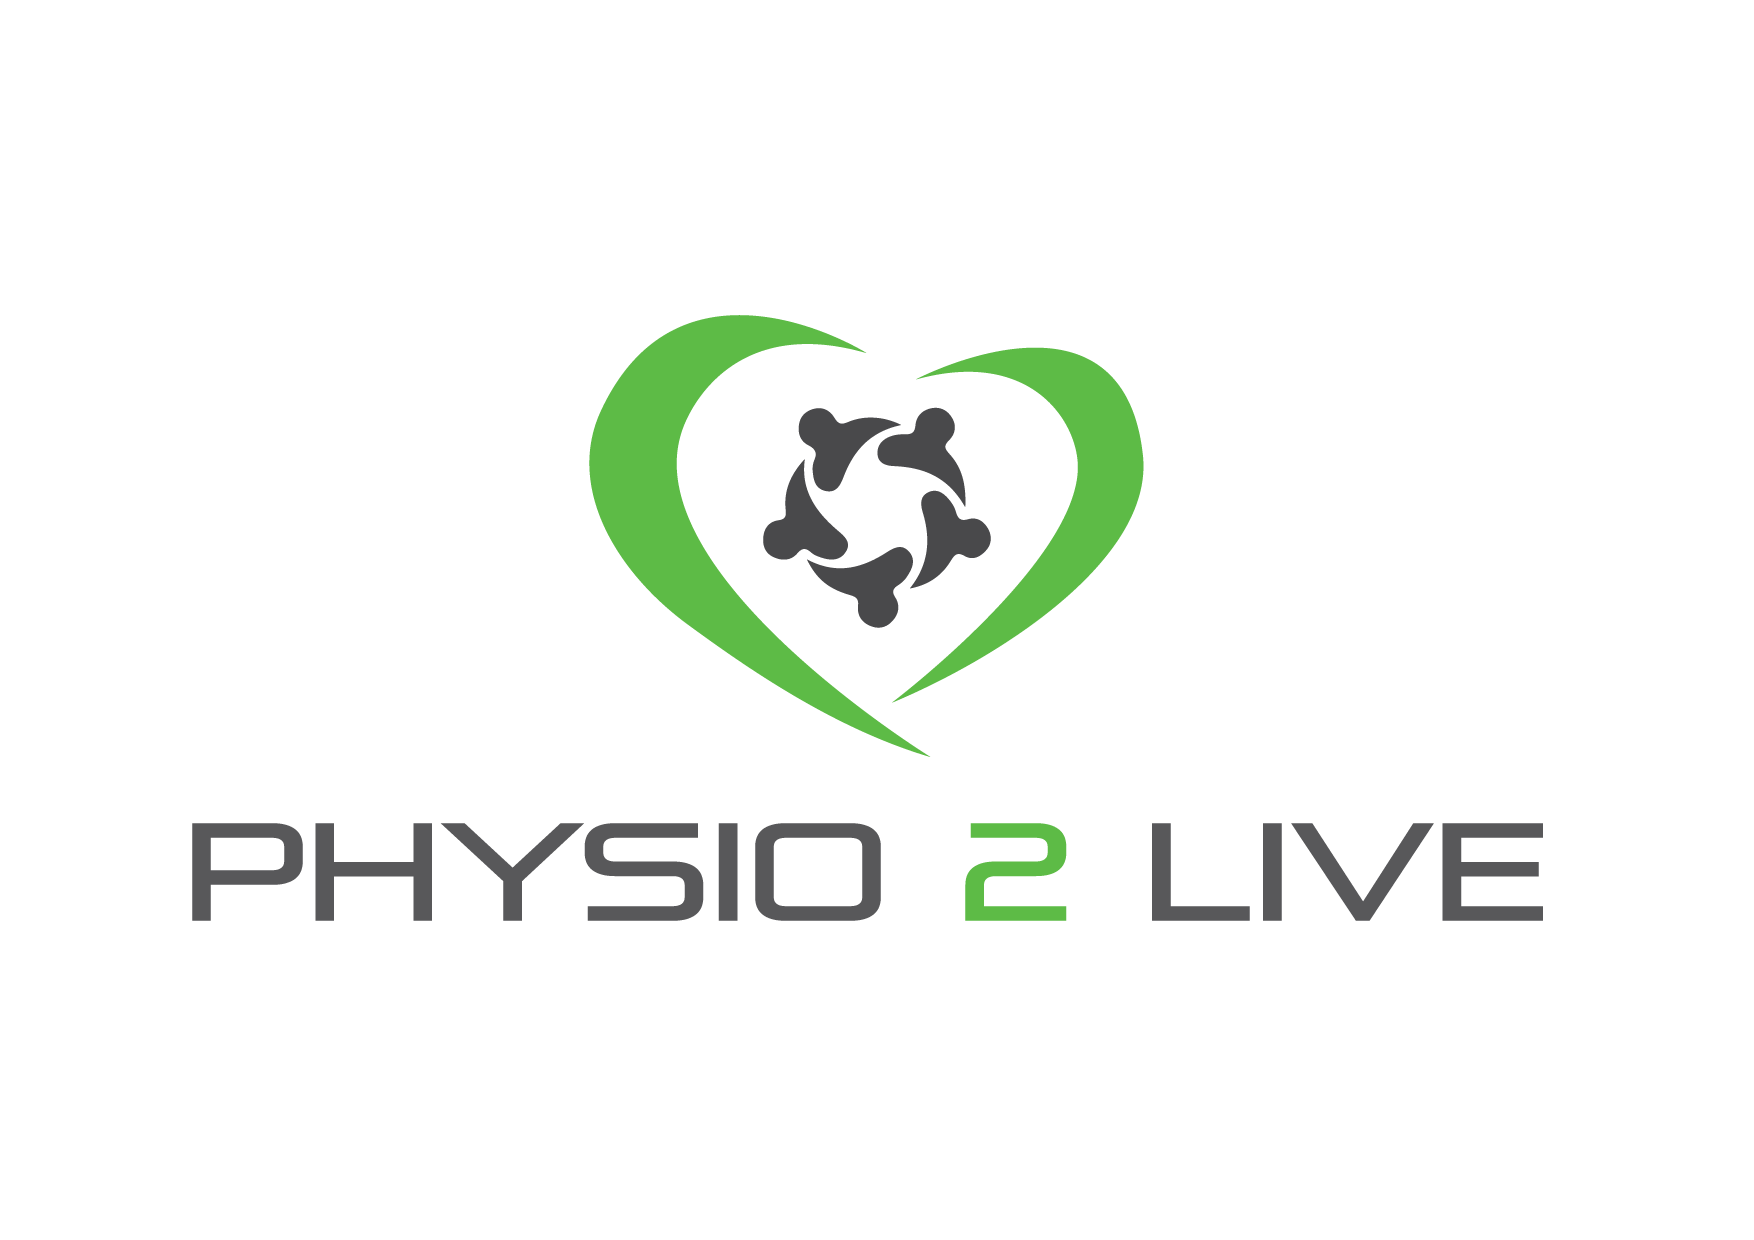 Physio 2 Live, Sports Injury & Wellness Clinic company logo